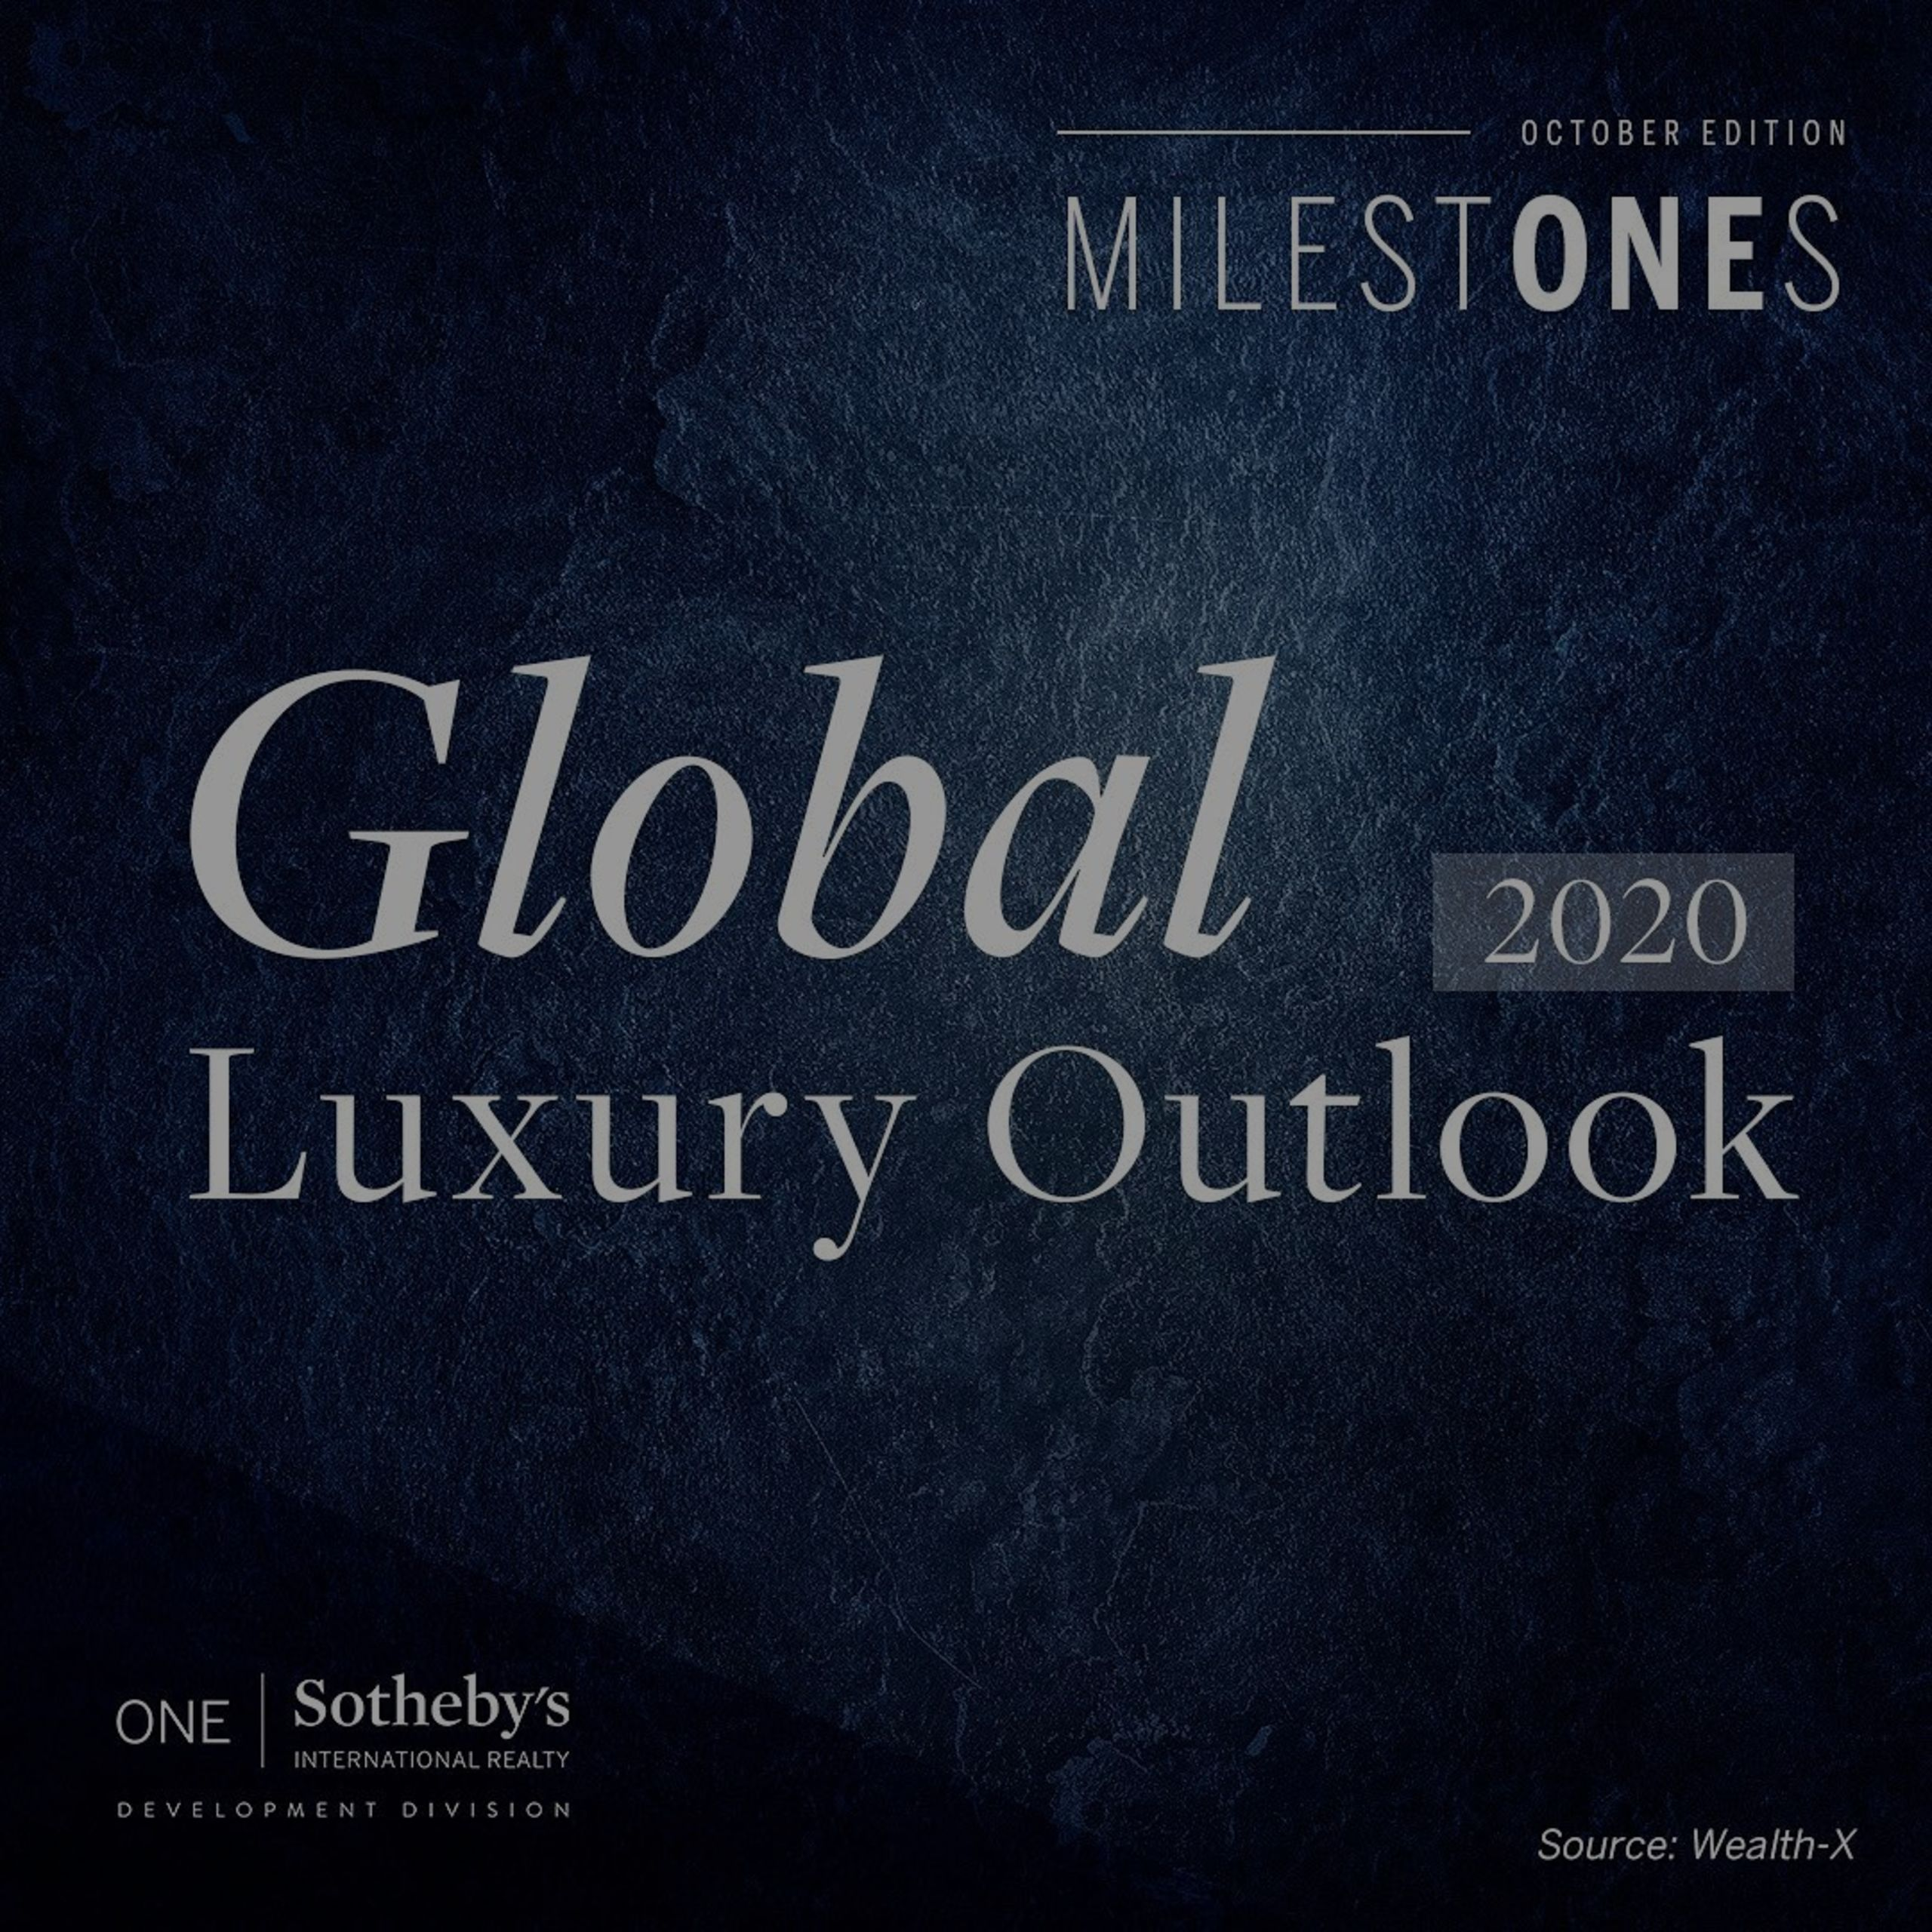 MilestONEs   October 2020 Edition